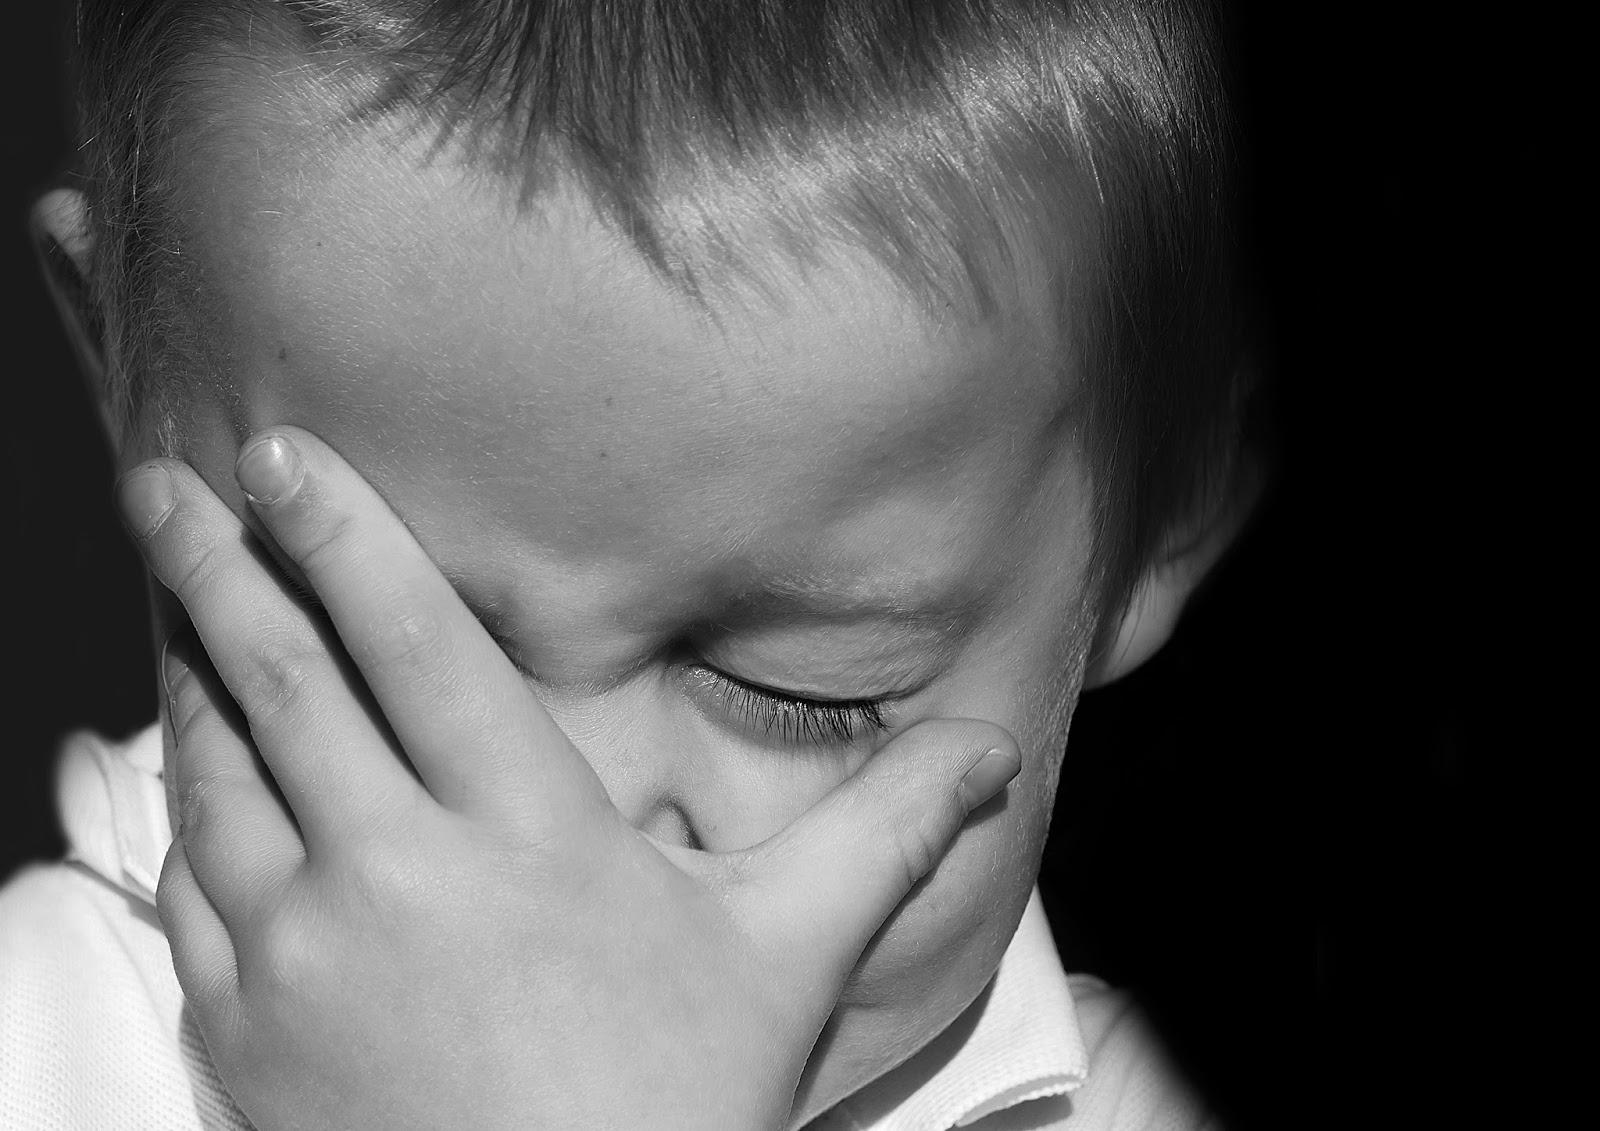 Suara Hati Seorang Anak